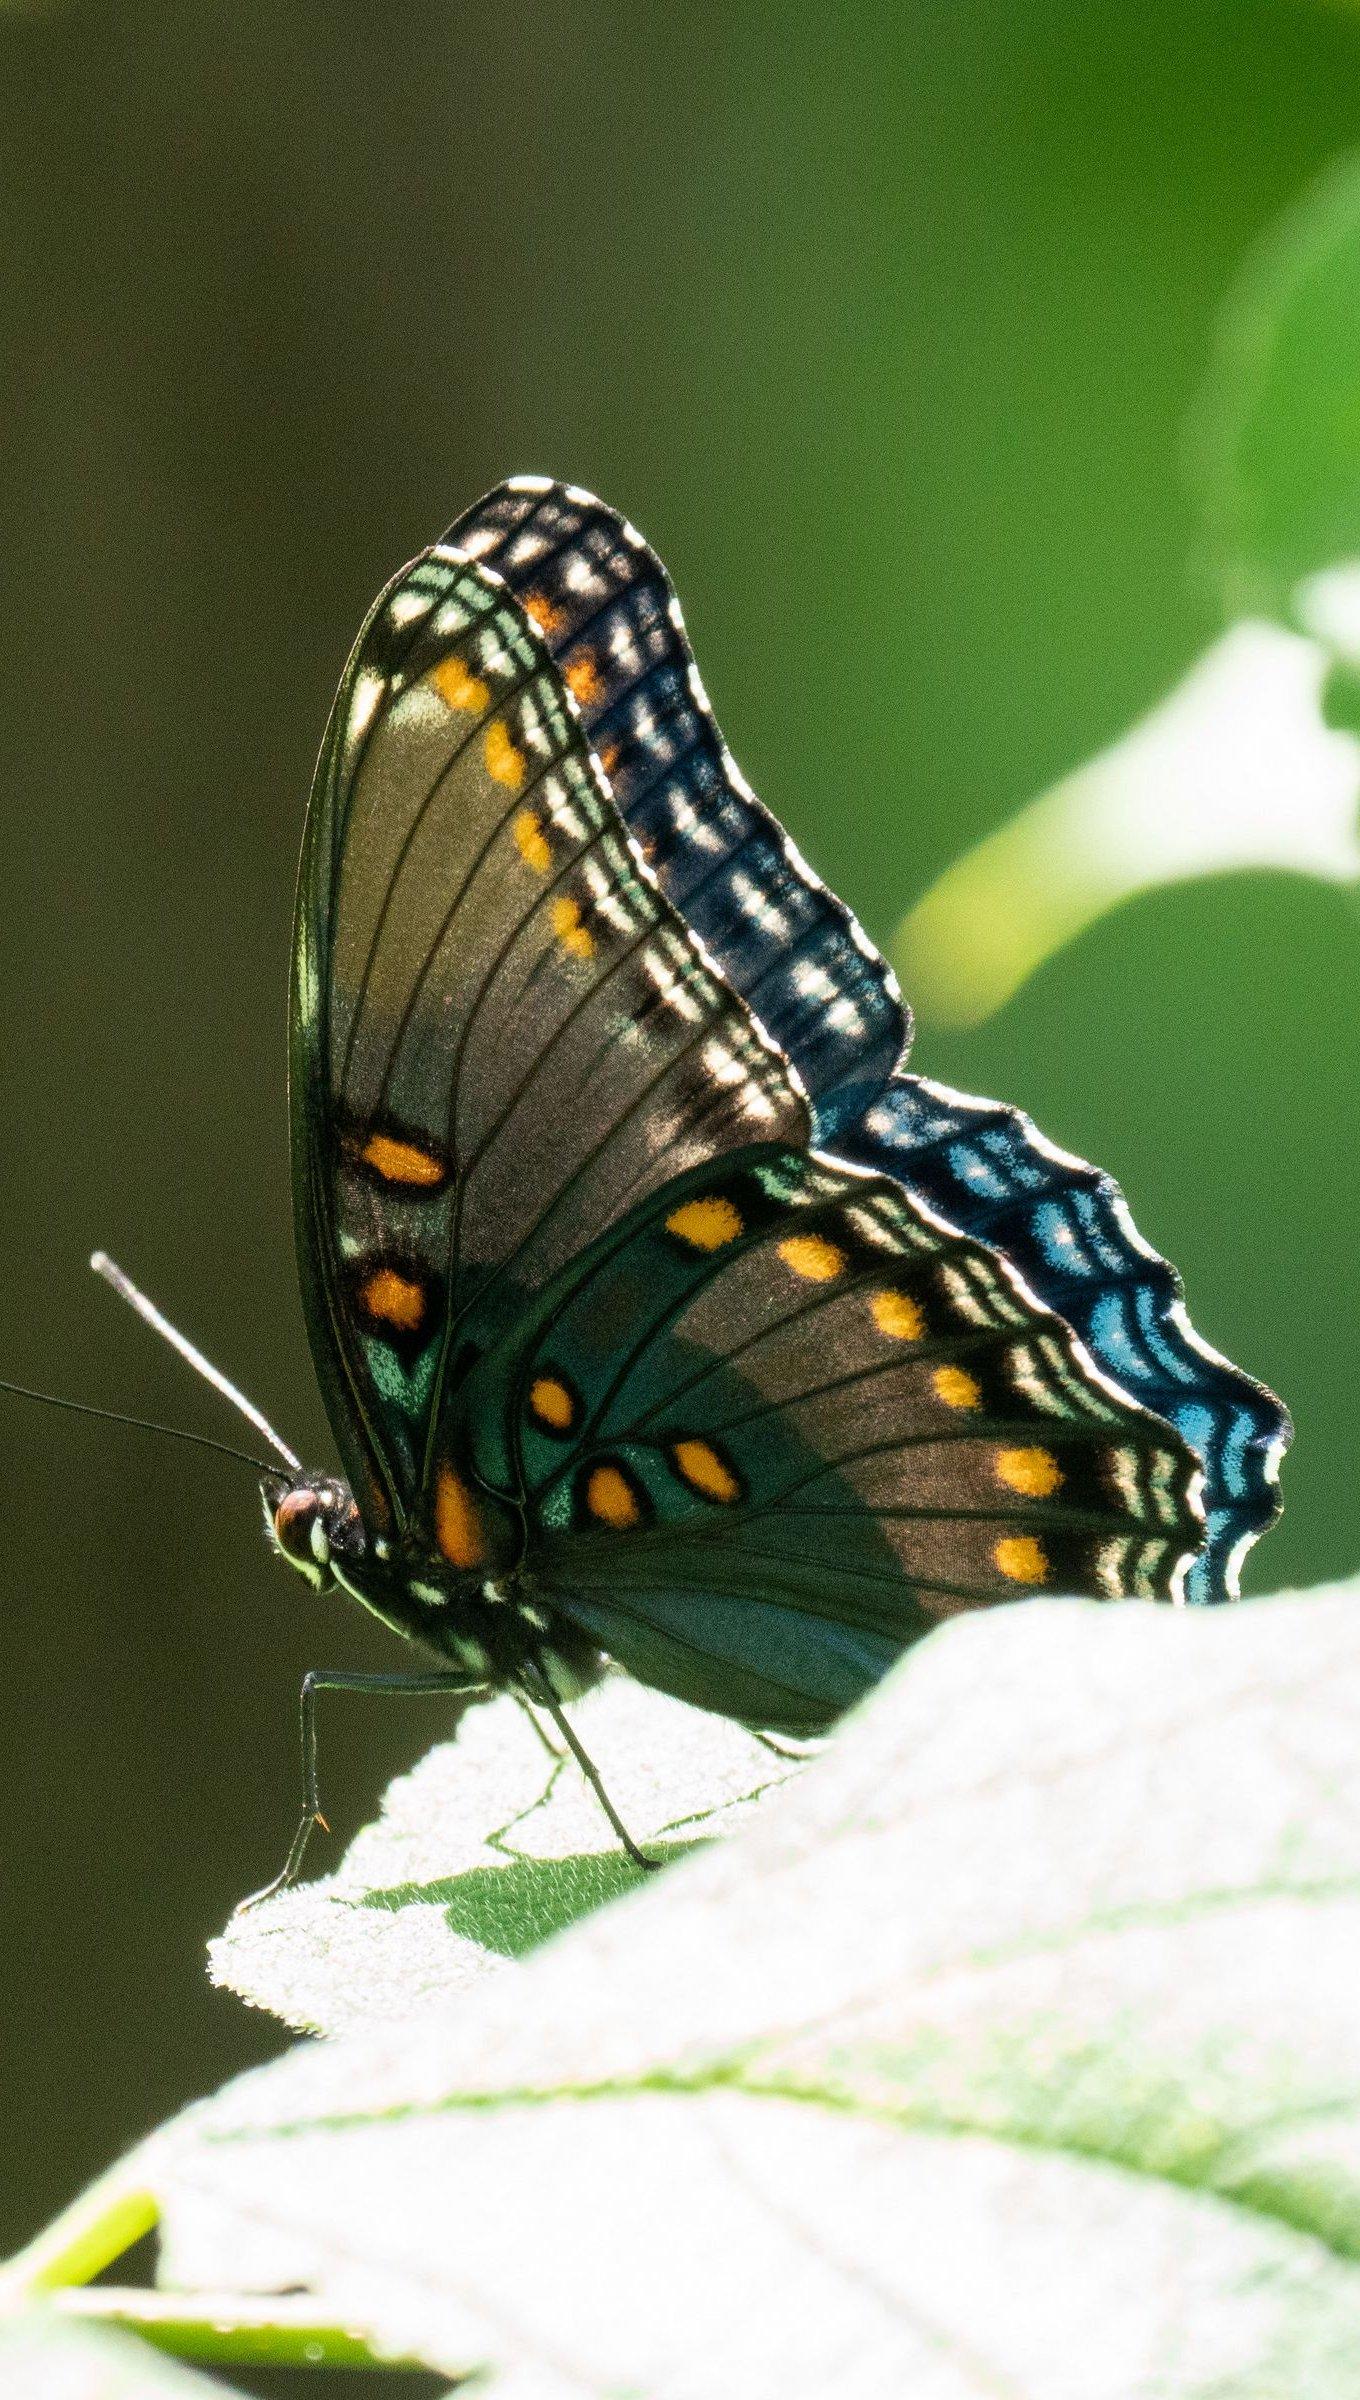 Fondos de pantalla Mariposa con alas tropicales Vertical